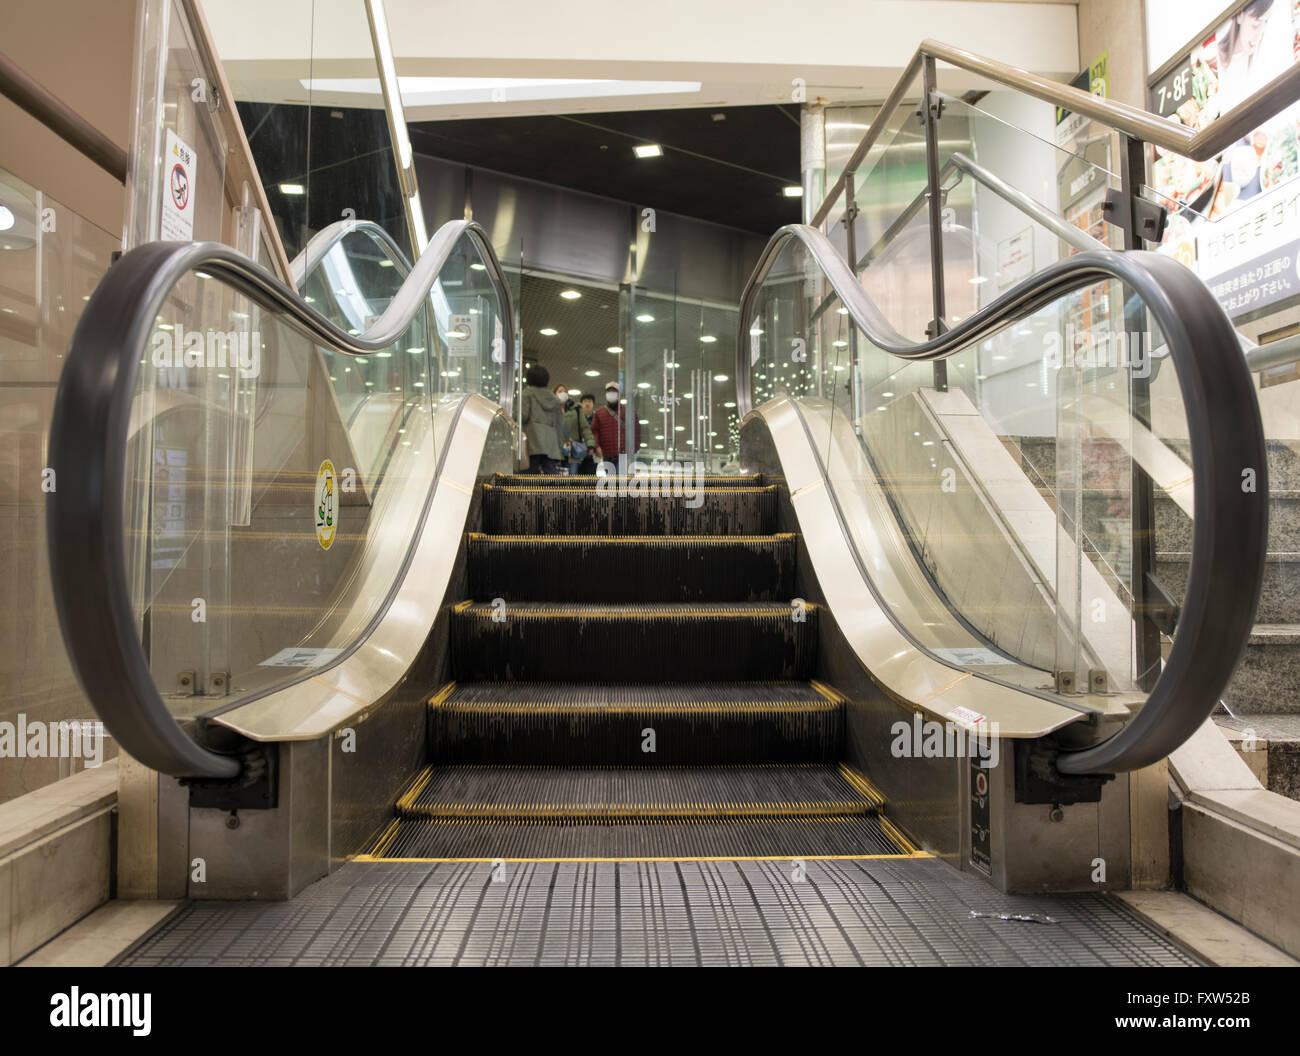 Petite Escalator 'Petitecalator' in between Kawasaki More's and the underground walkway. World's - Stock Image